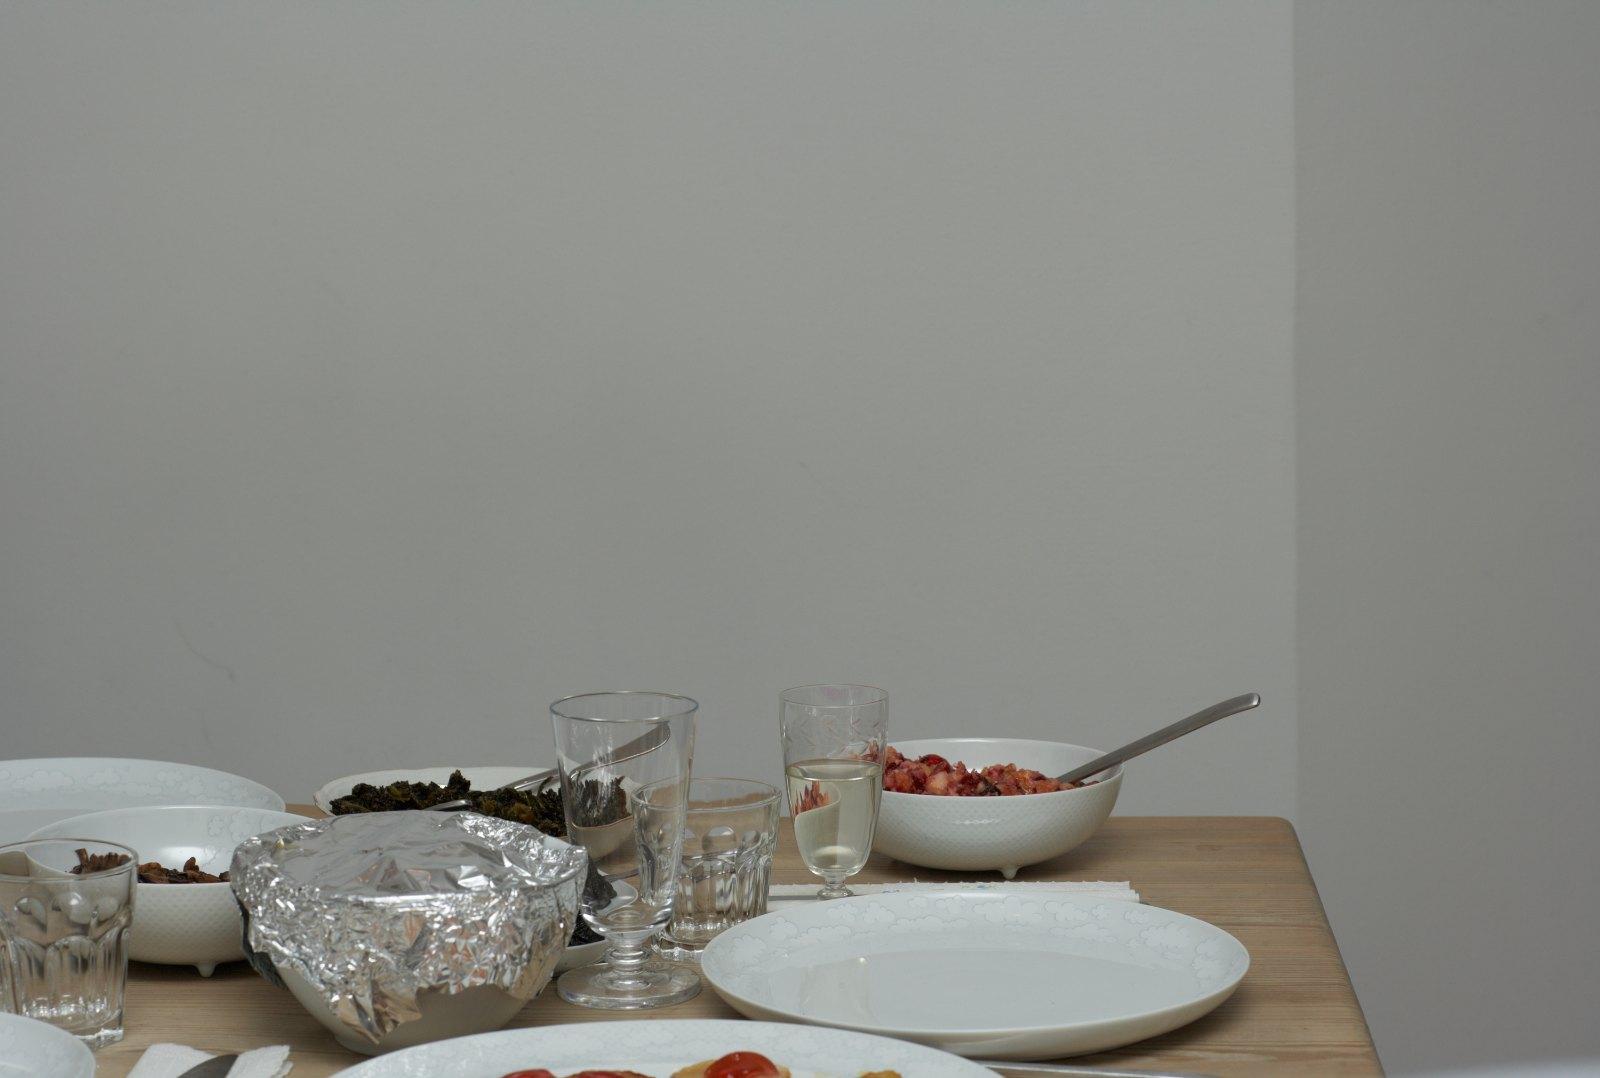 Meal, 2010, c-print, 57,2 x 80,1 cm